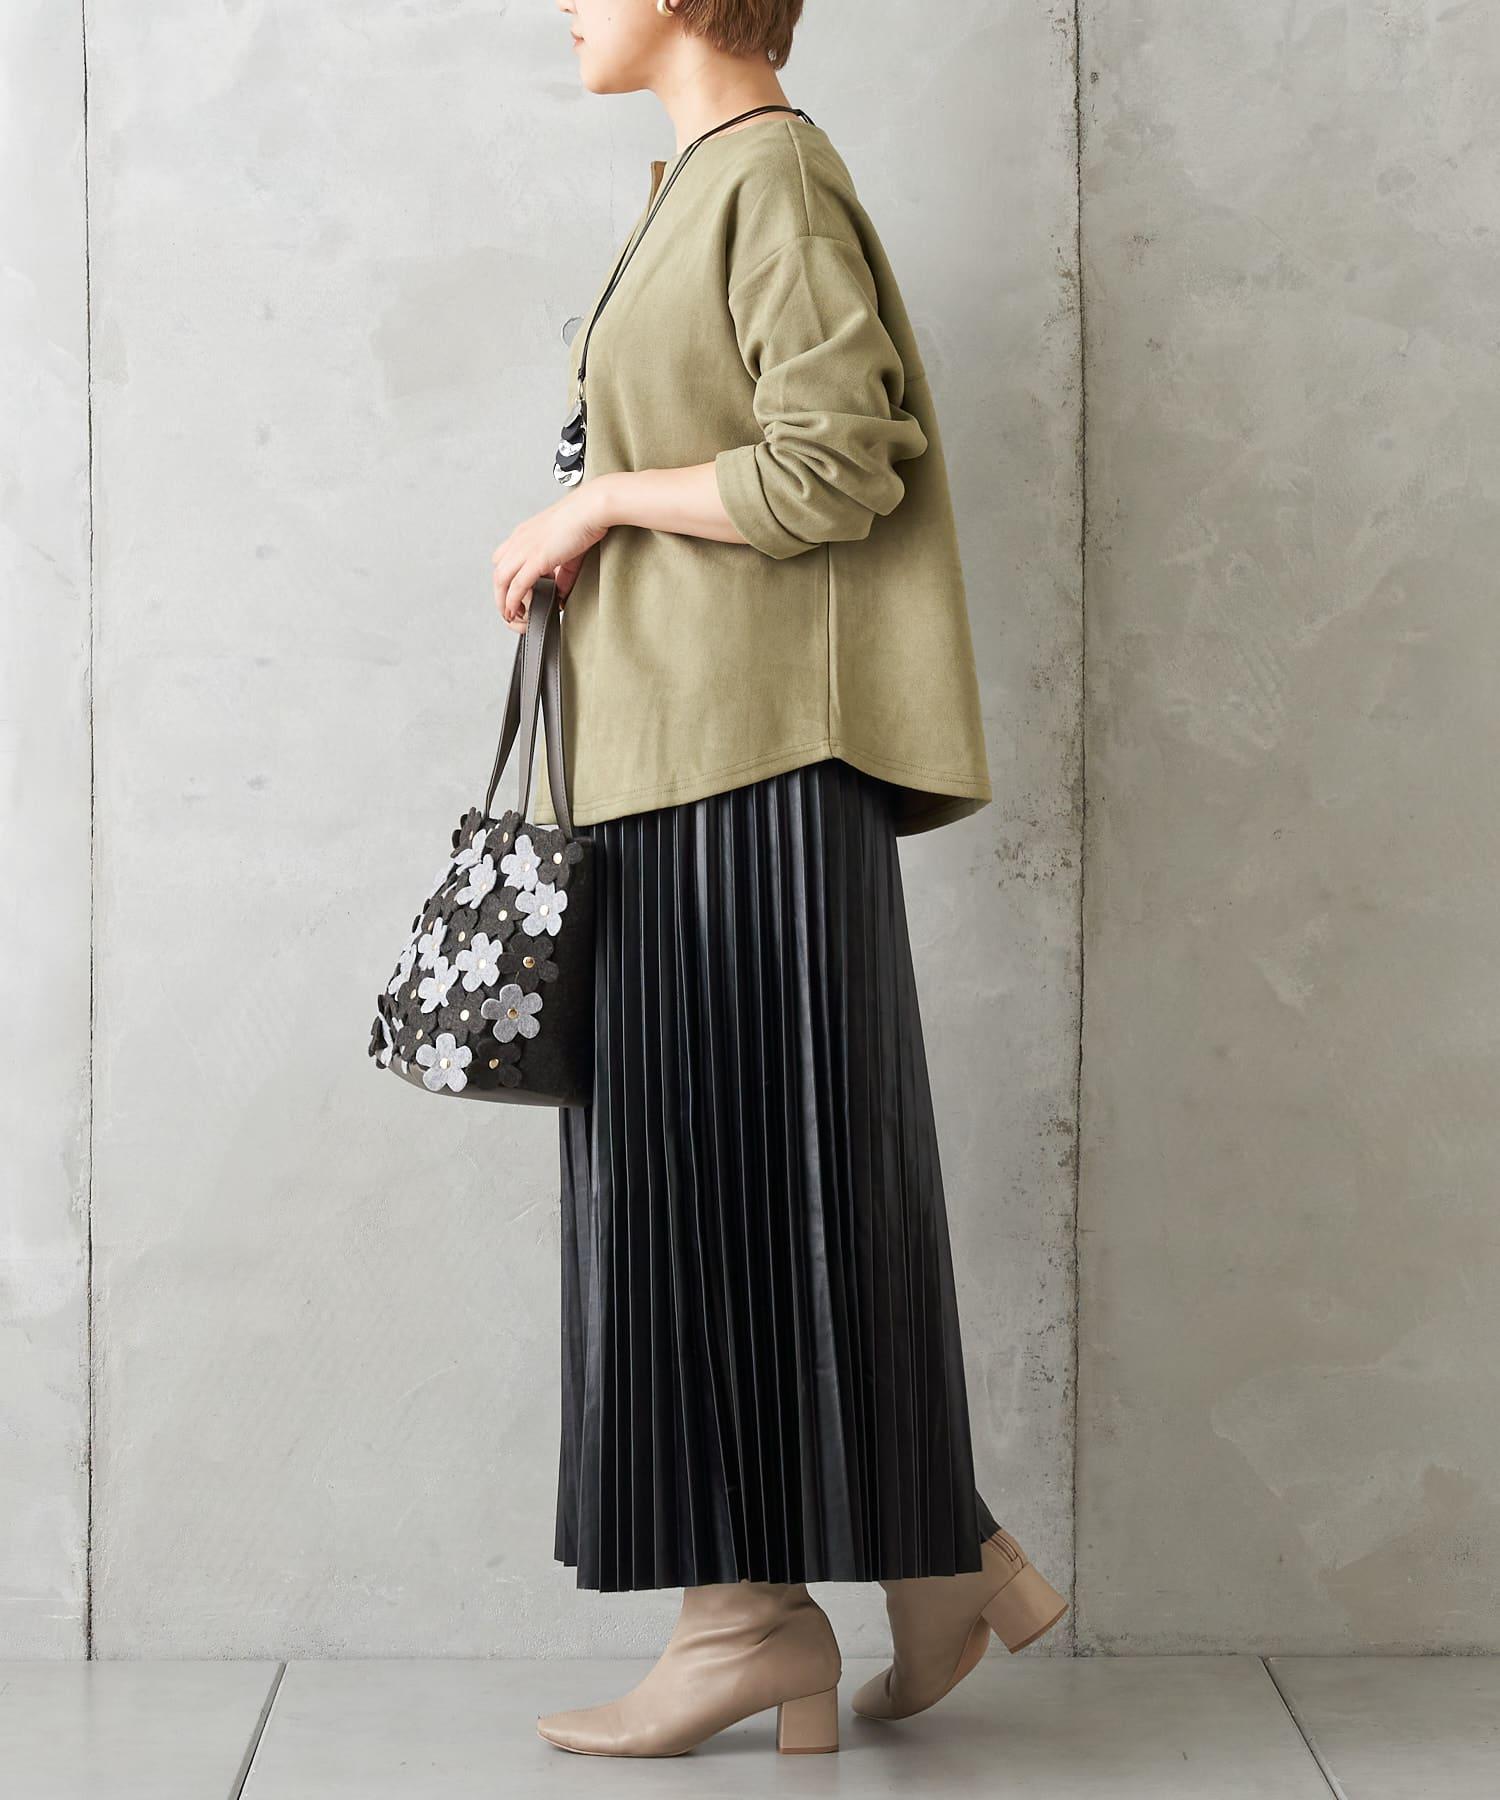 Pal collection(パルコレクション) 《今年注目アイテム》エコレザープリーツスカート